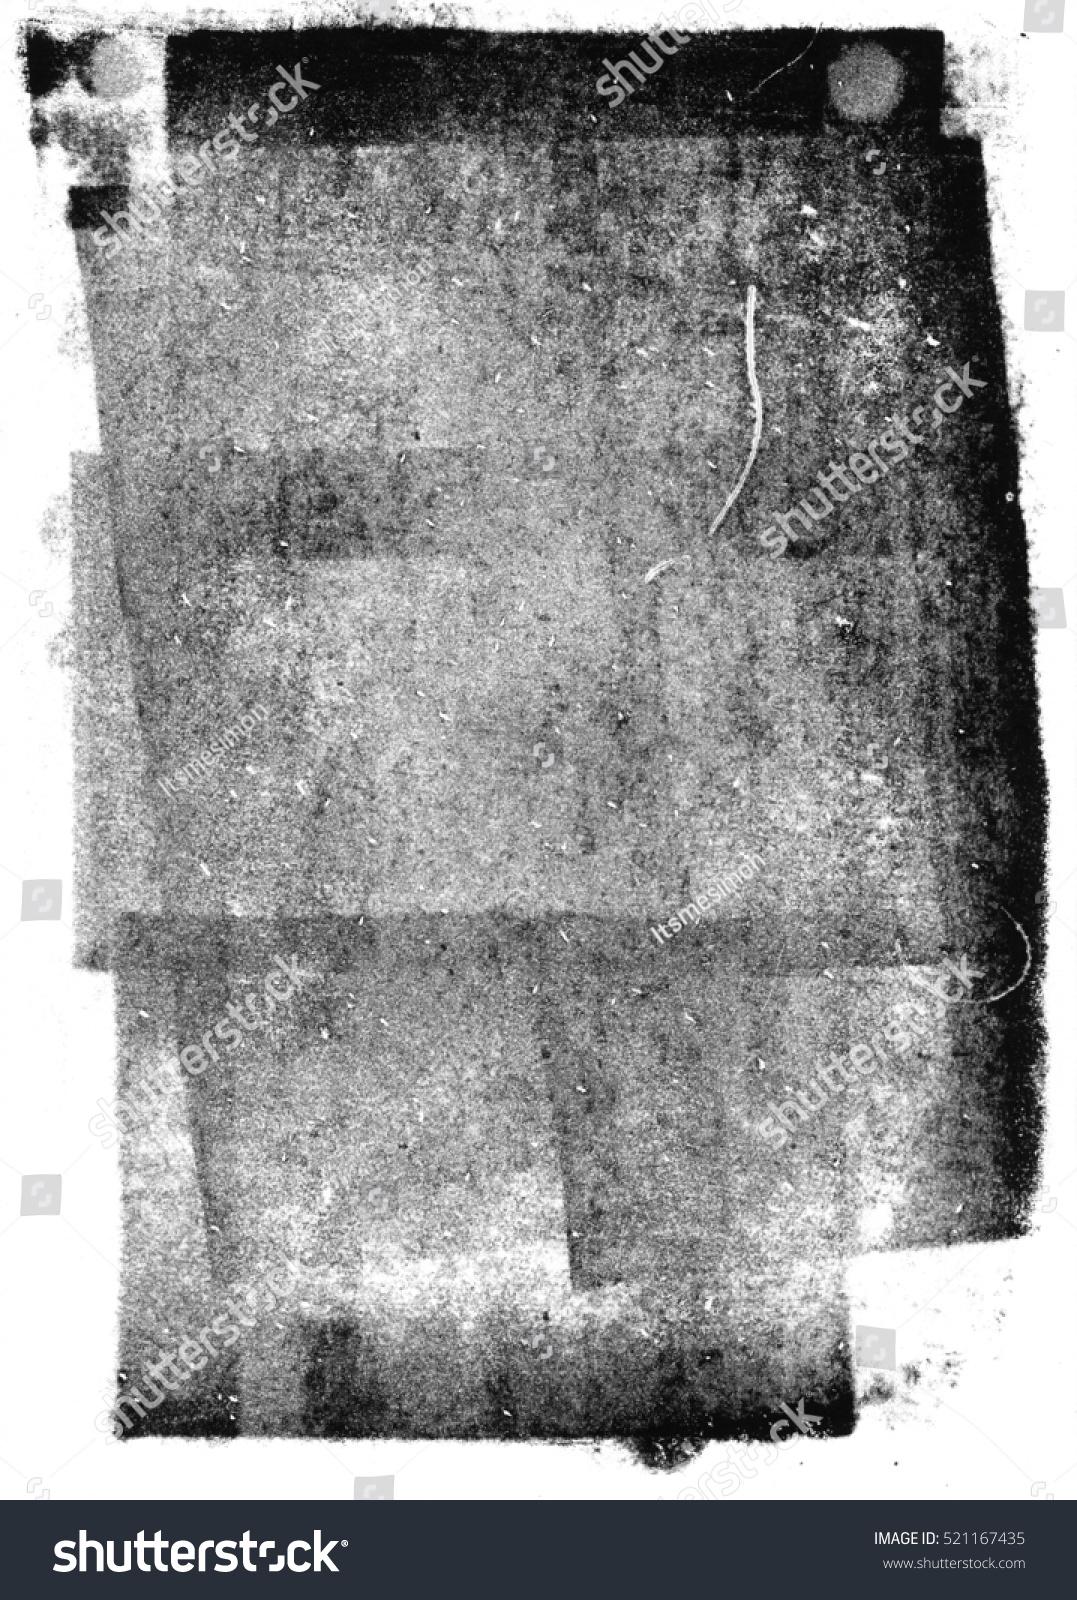 Black Letterpress Ink Texture Stock Photo 521167435 ...